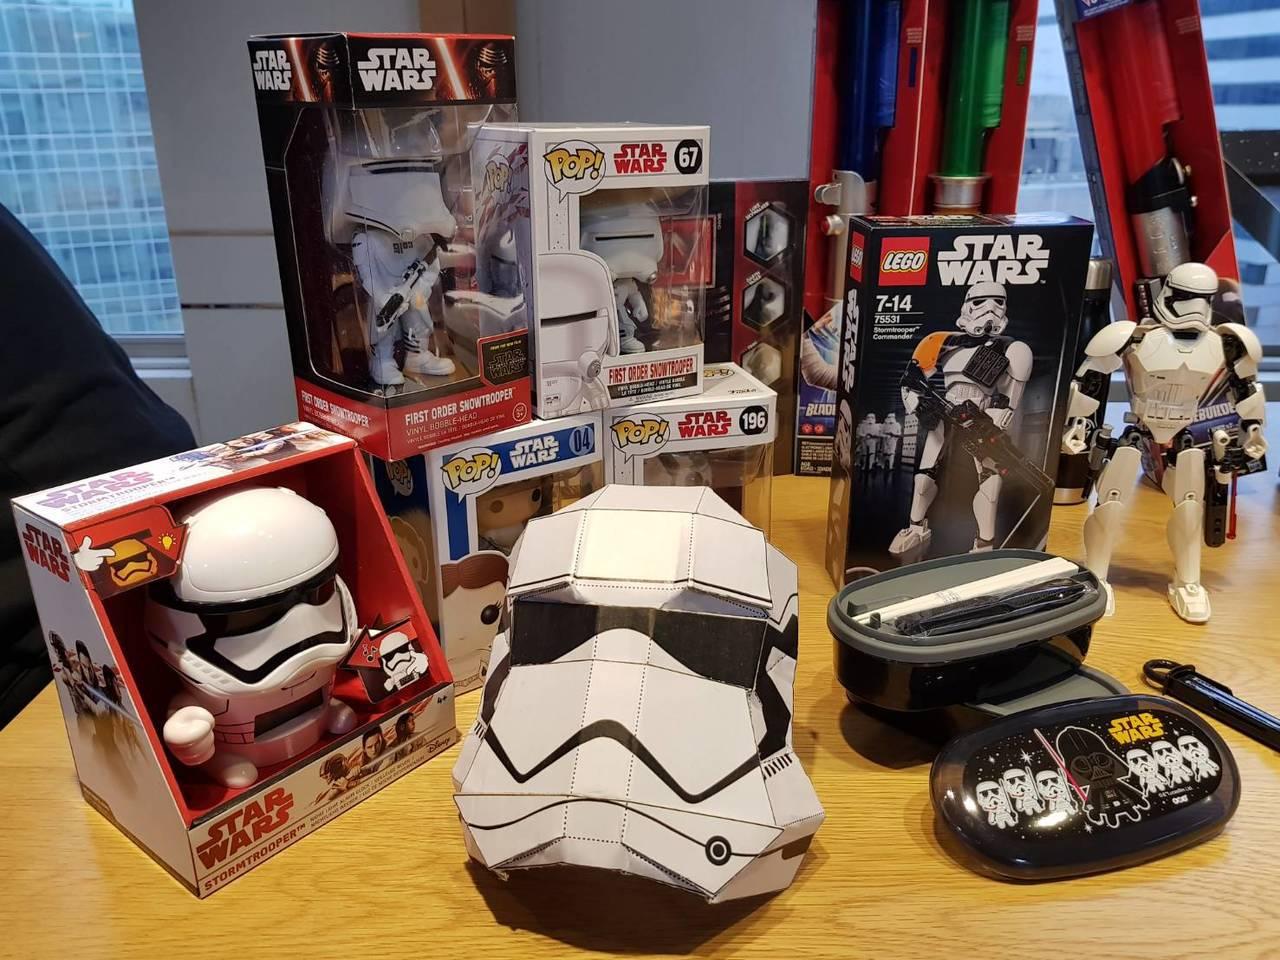 friDay購物集結全站STAR WARS授權商品成立「星際大戰主題活動頁」。圖...